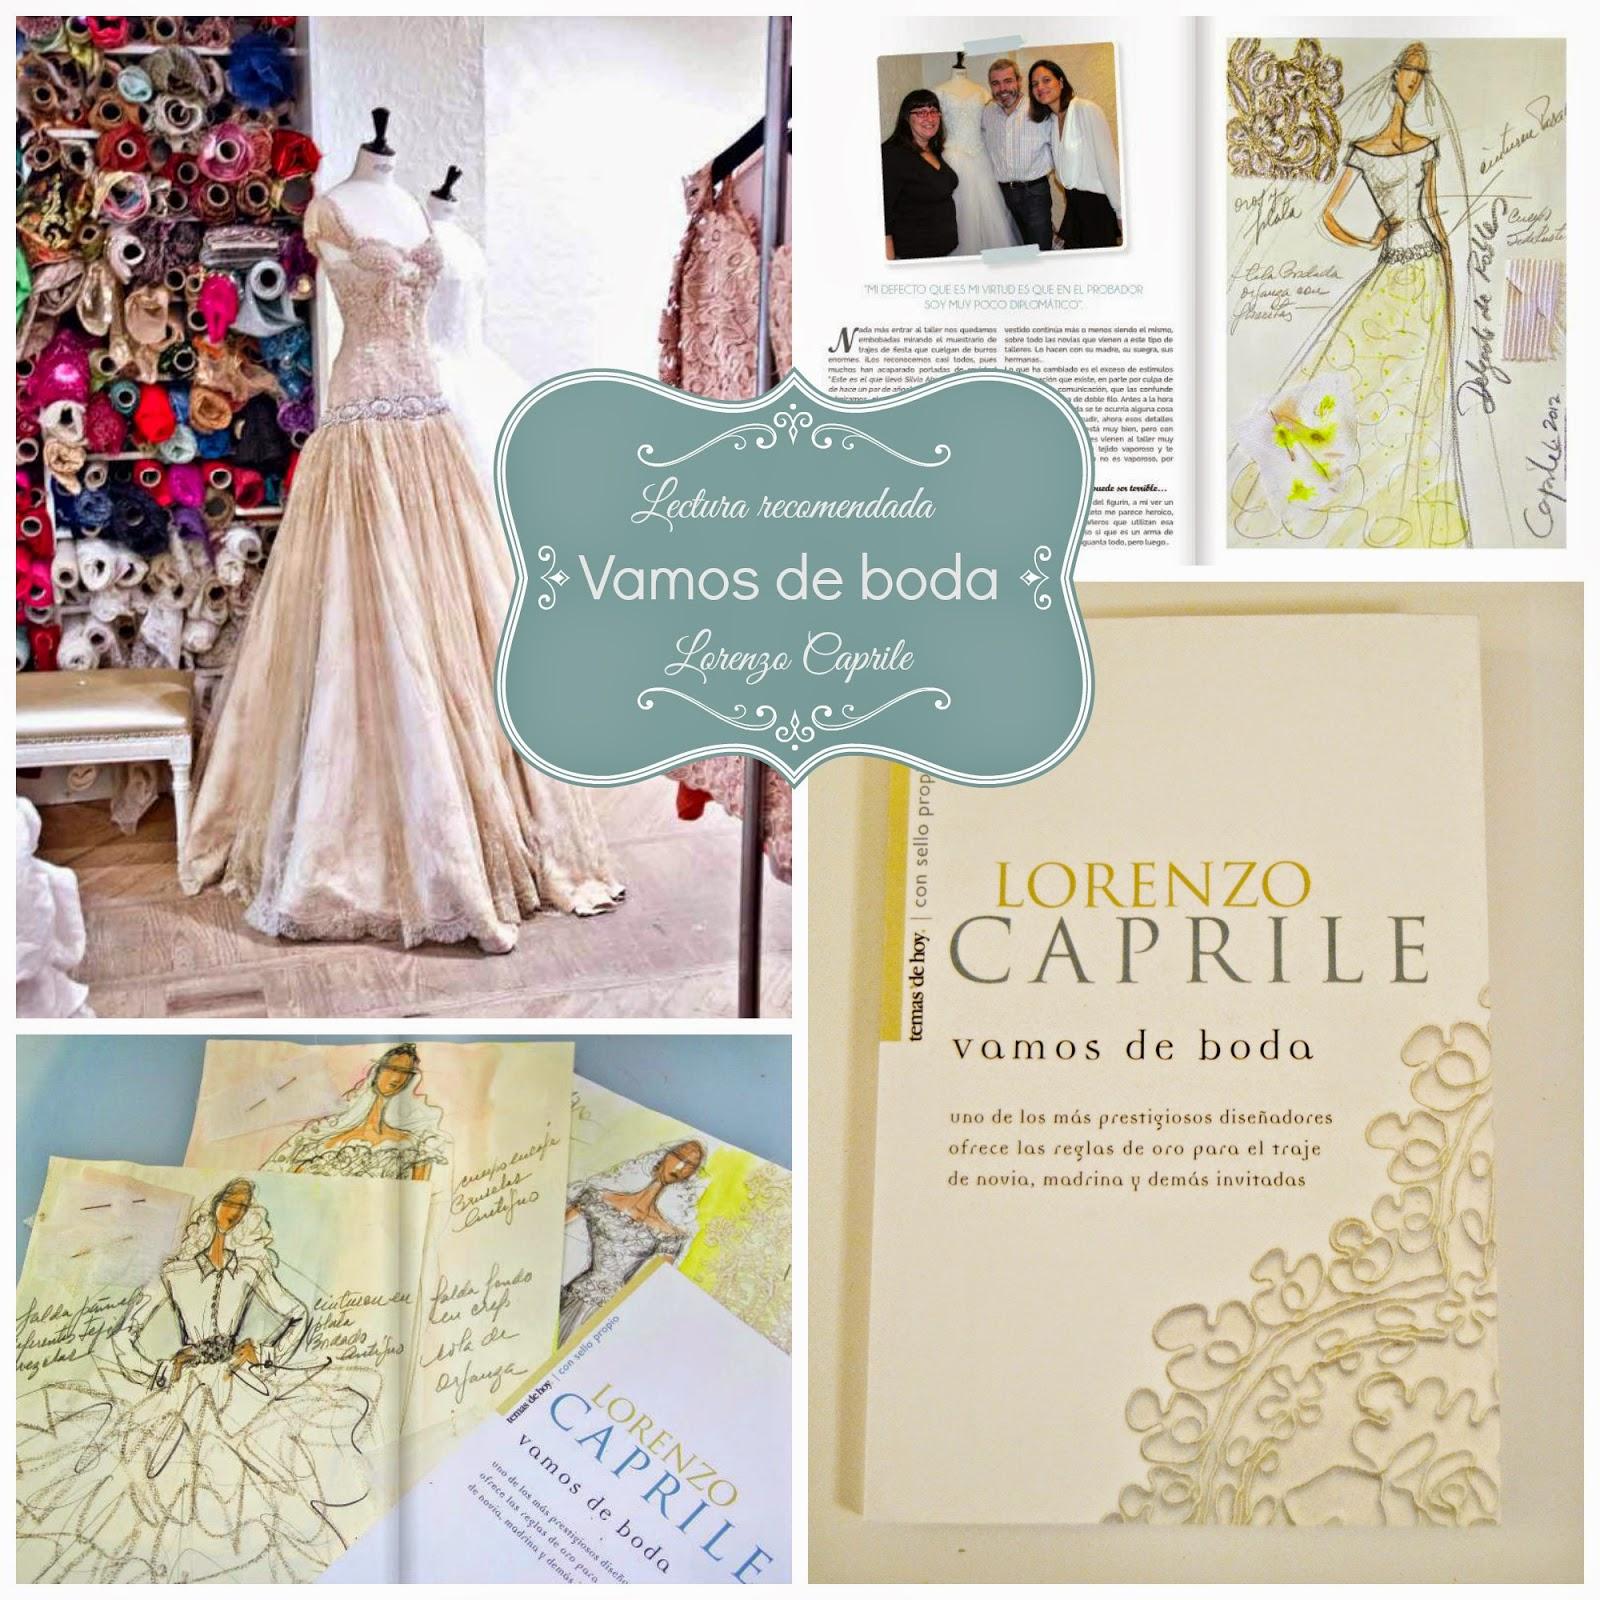 atelier lorenzo caprile libro vamos de boda blog bodas mi boda gratis